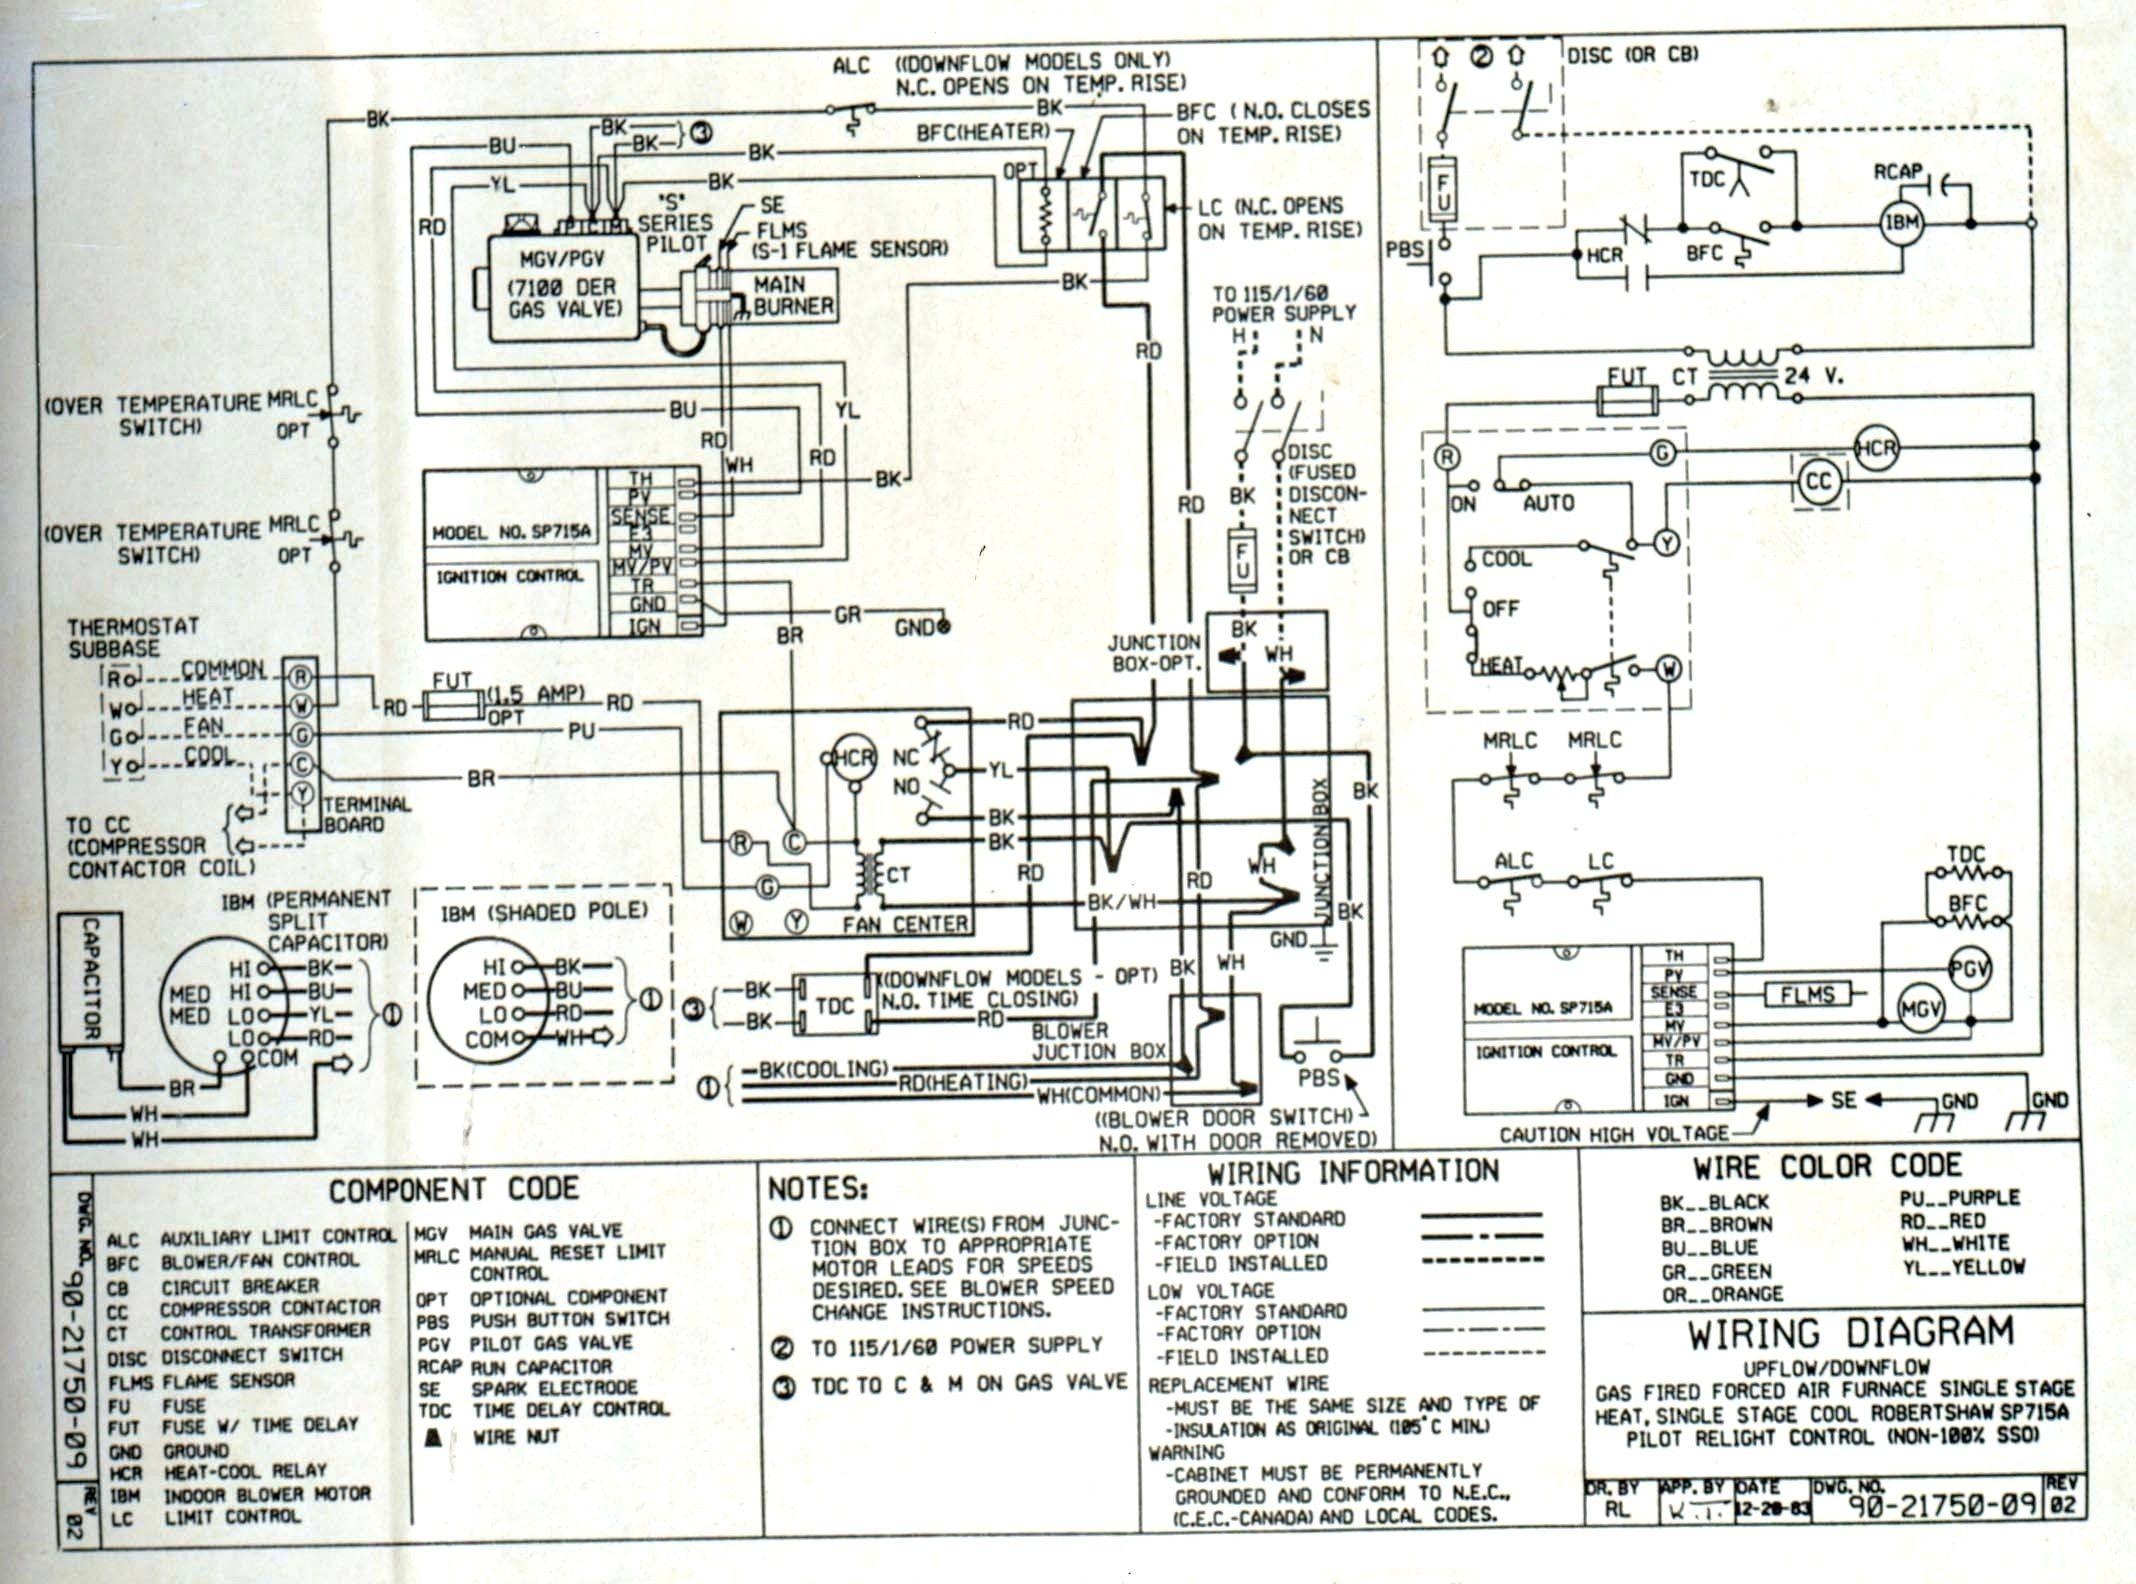 Unique Reading Electrical Drawings Diagram Wiringdiagram Diagramming Diagramm Visuals Visualisation Gr Electrical Diagram Diagram Trailer Wiring Diagram